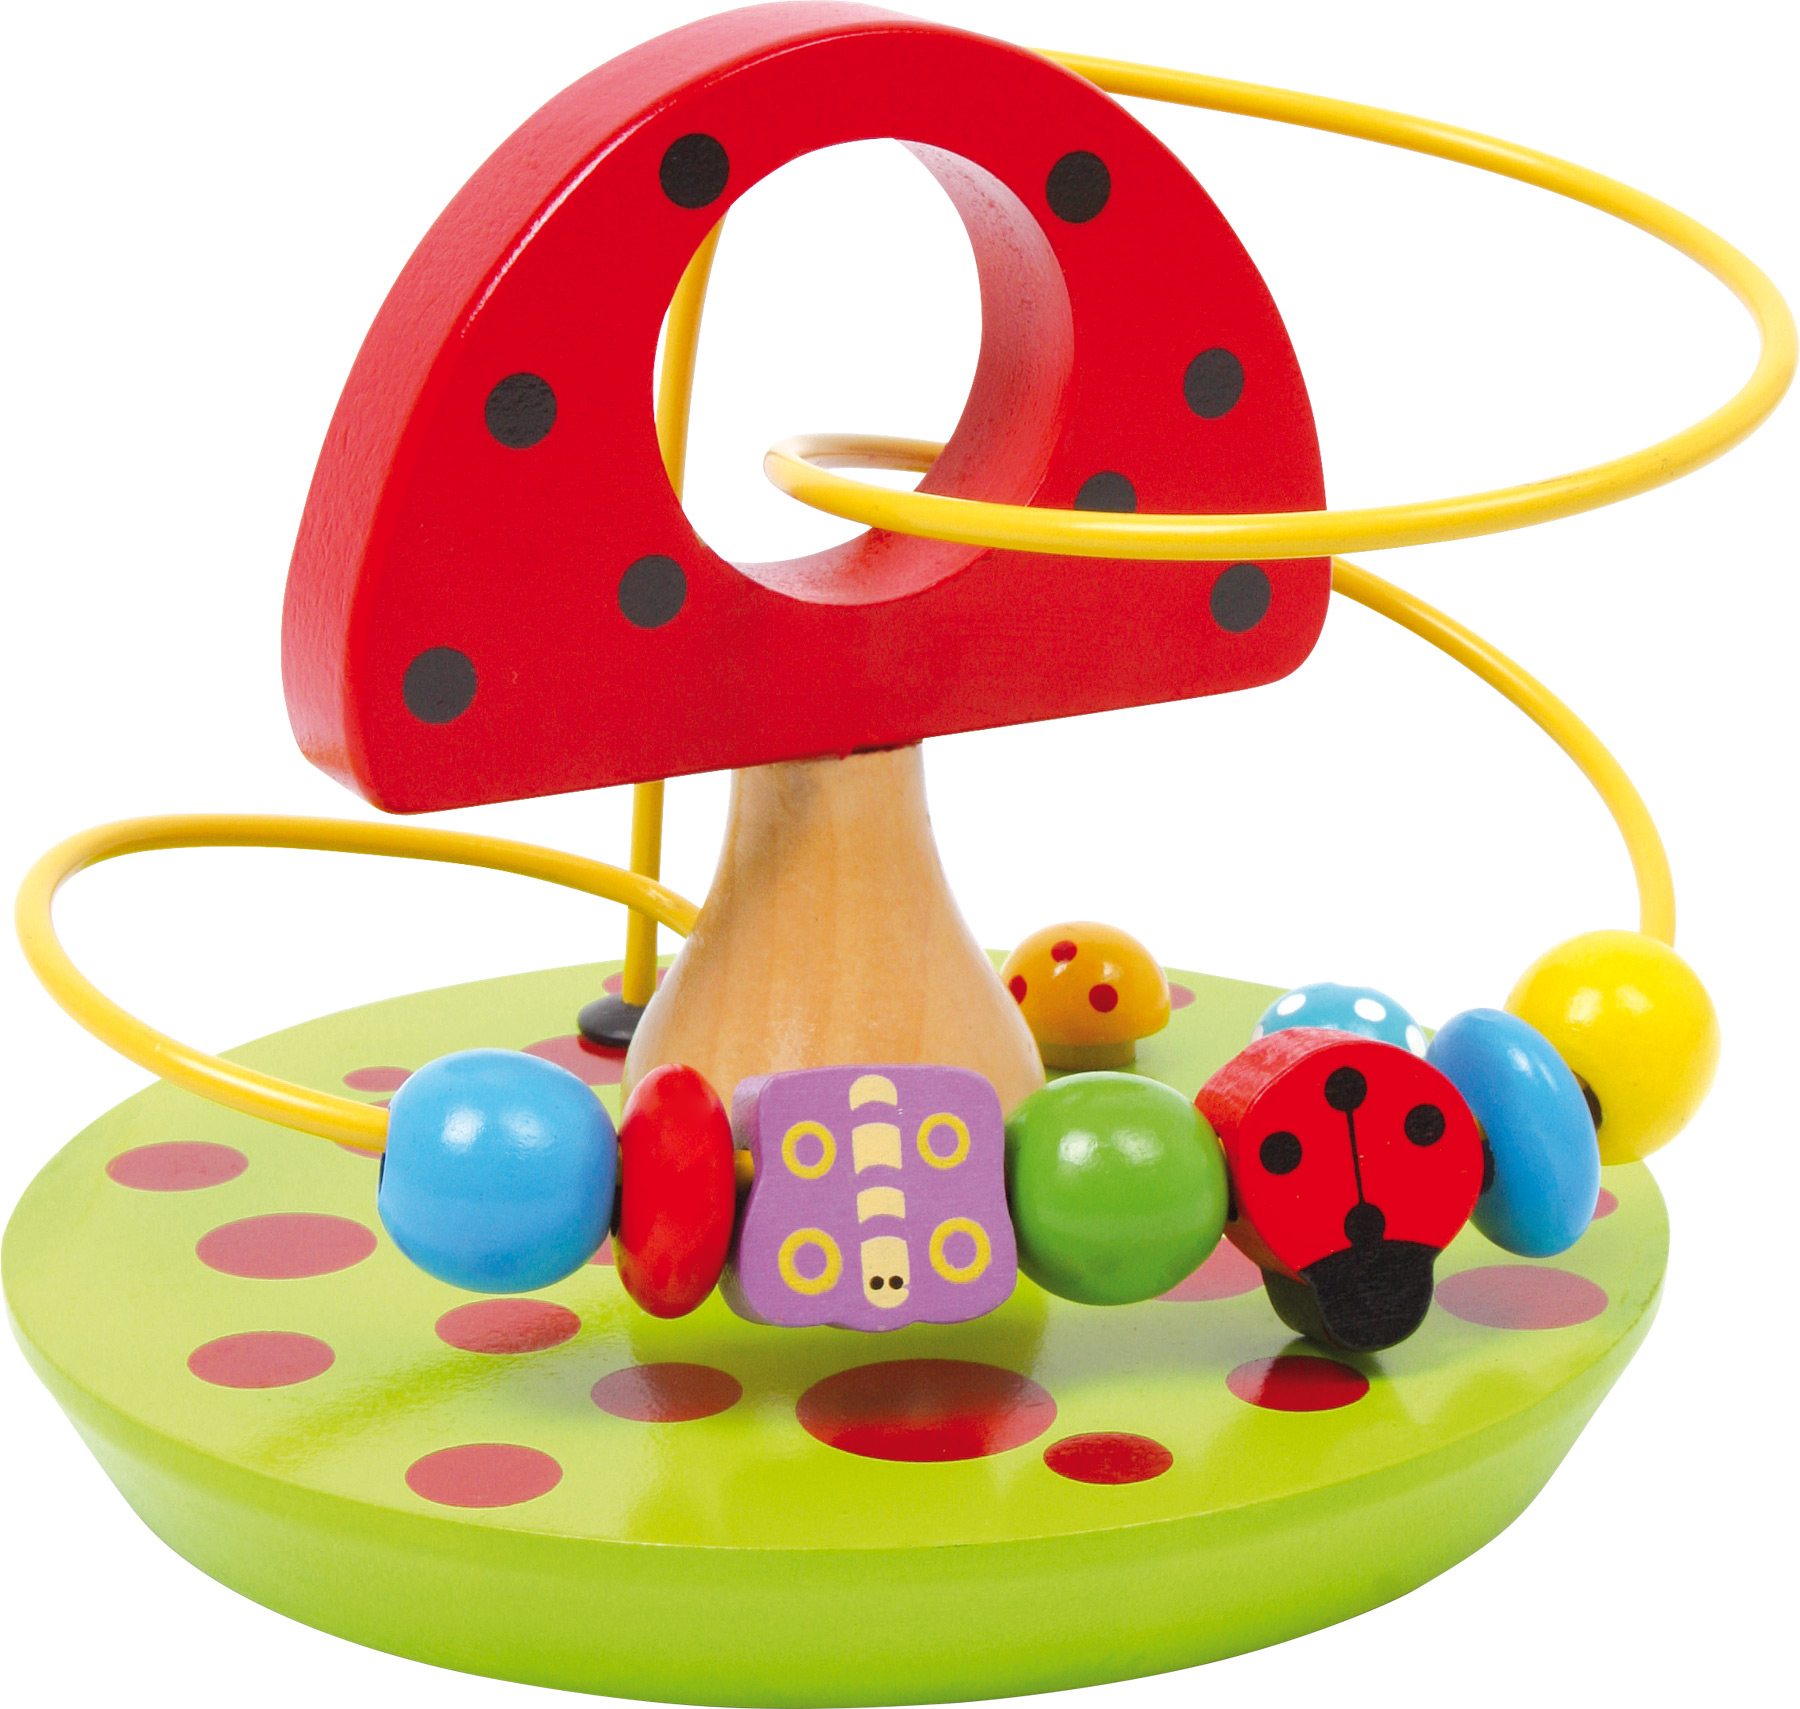 "Jucarie activitate motrica ""Ciuperca"" - Jucarie educativa din lemn pentru bebe"